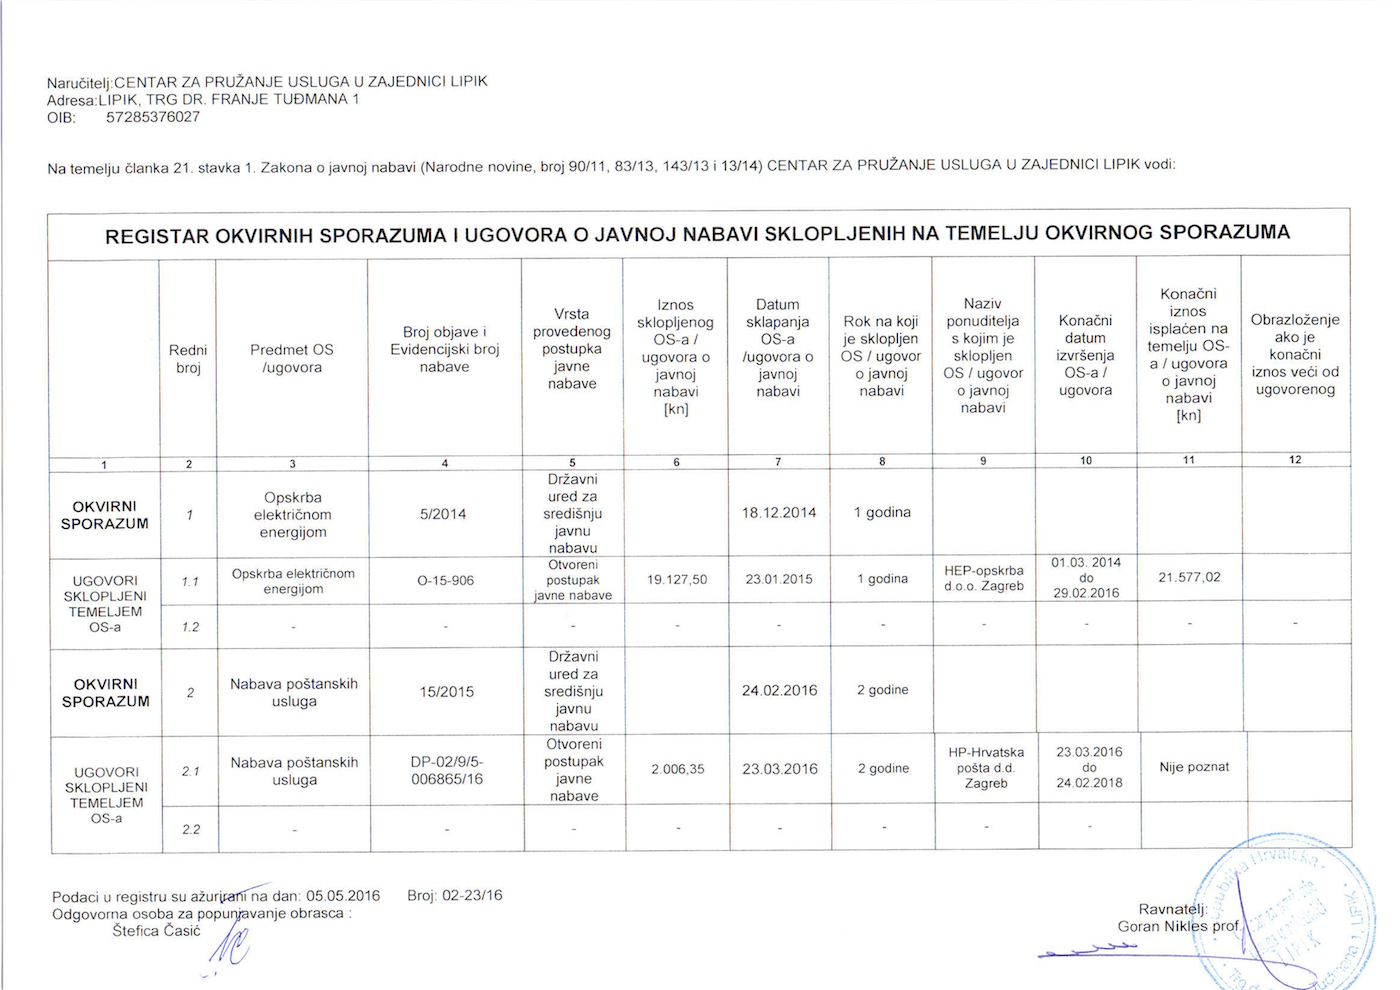 Registar okvirnih sporazuma